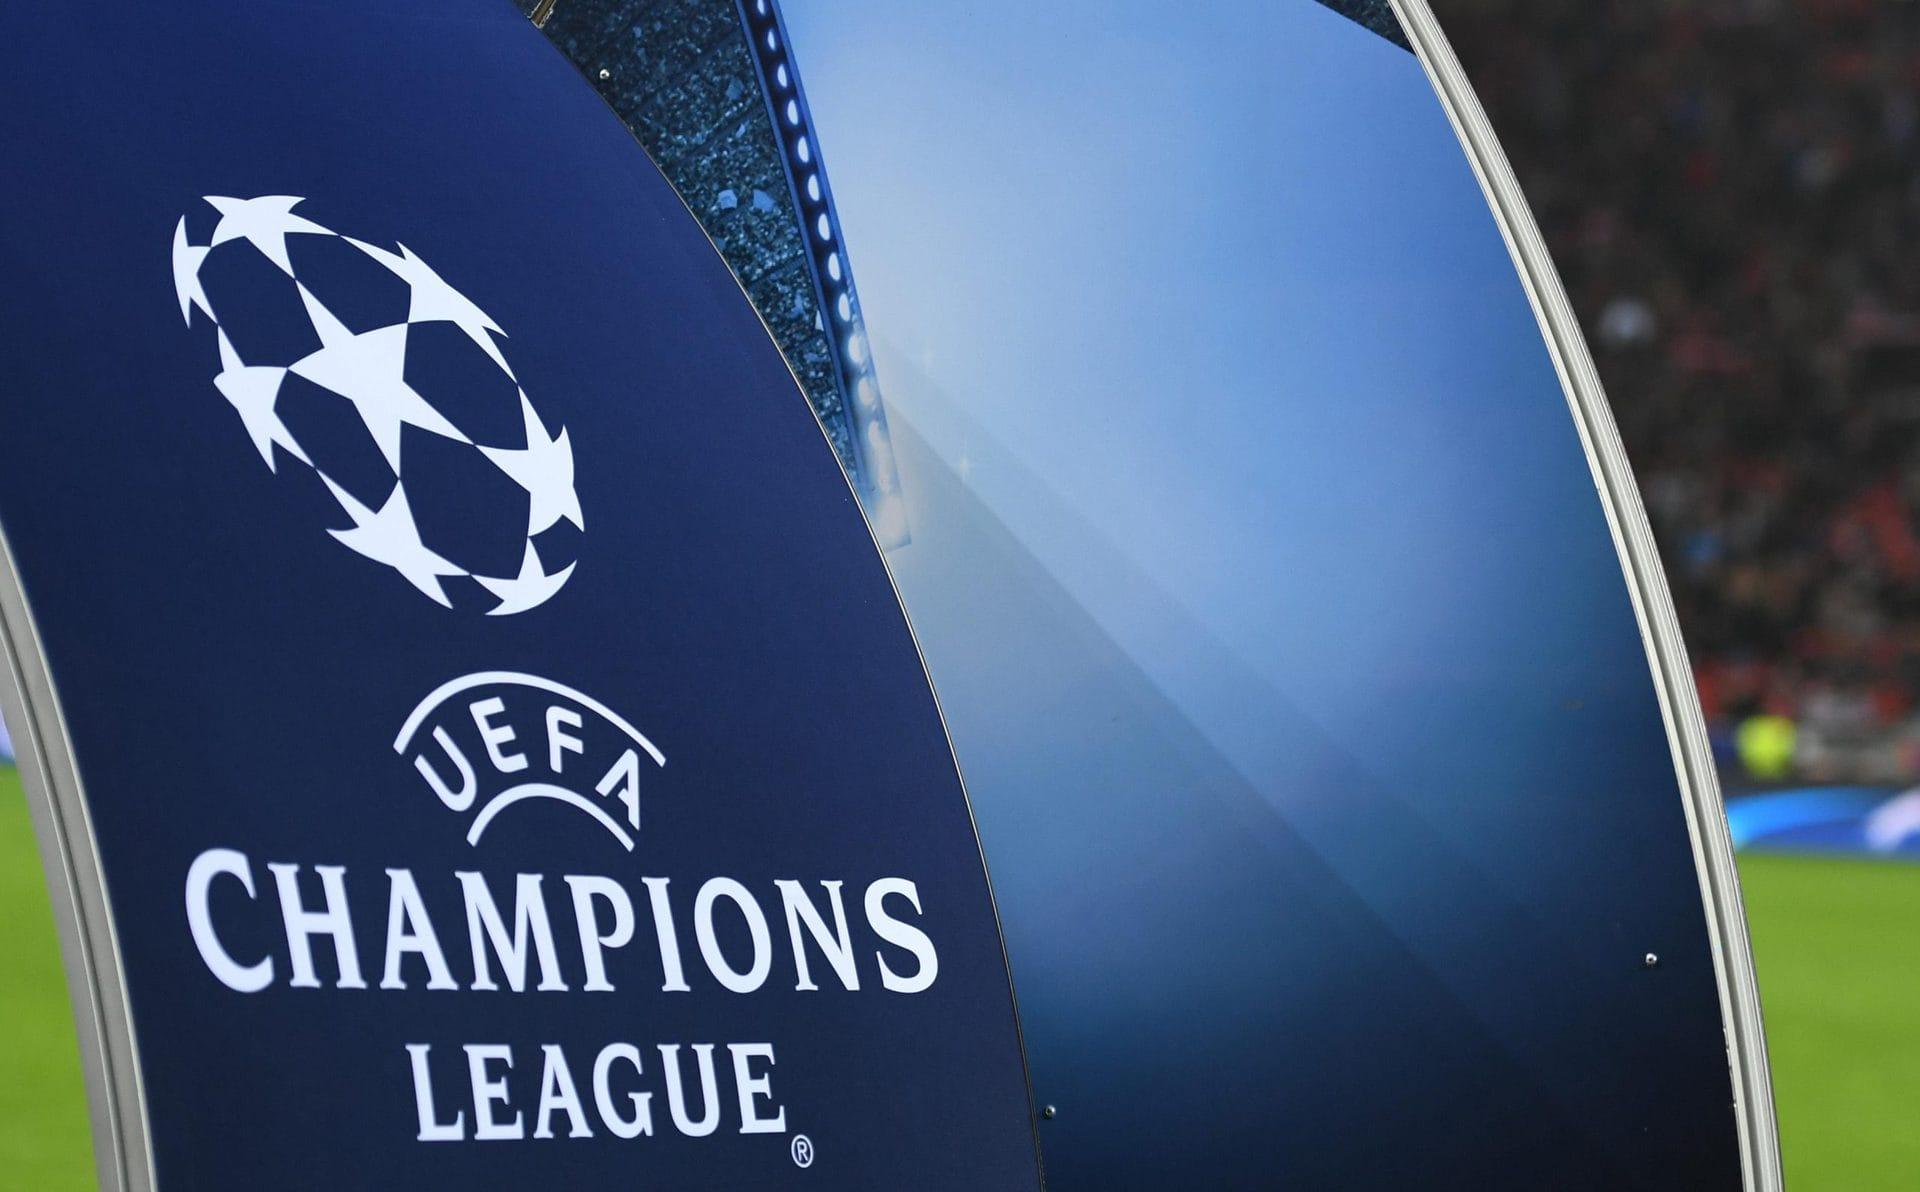 Champions-League-Endspiel läuft nicht im Free-TV Finale am 29. Mai